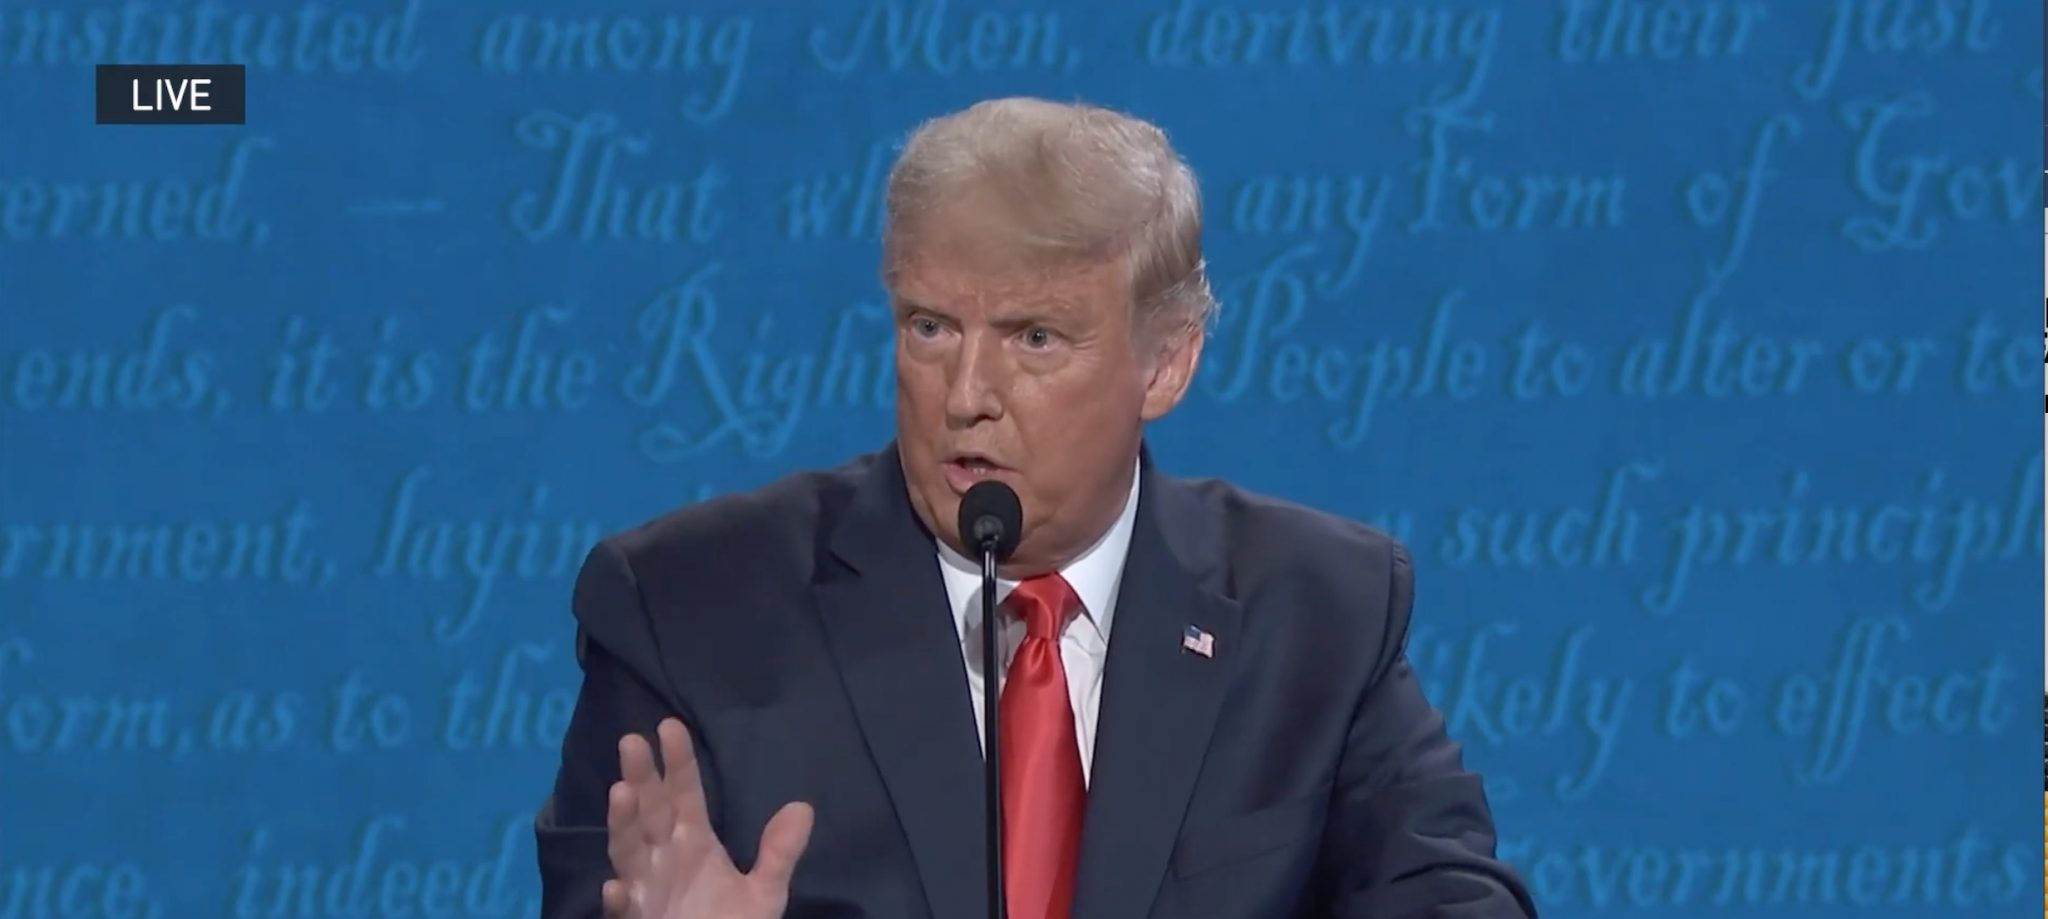 Donald Trump Won the Debate | The American Spectator | USA News and PoliticsThe American Spectator | USA News and Politics